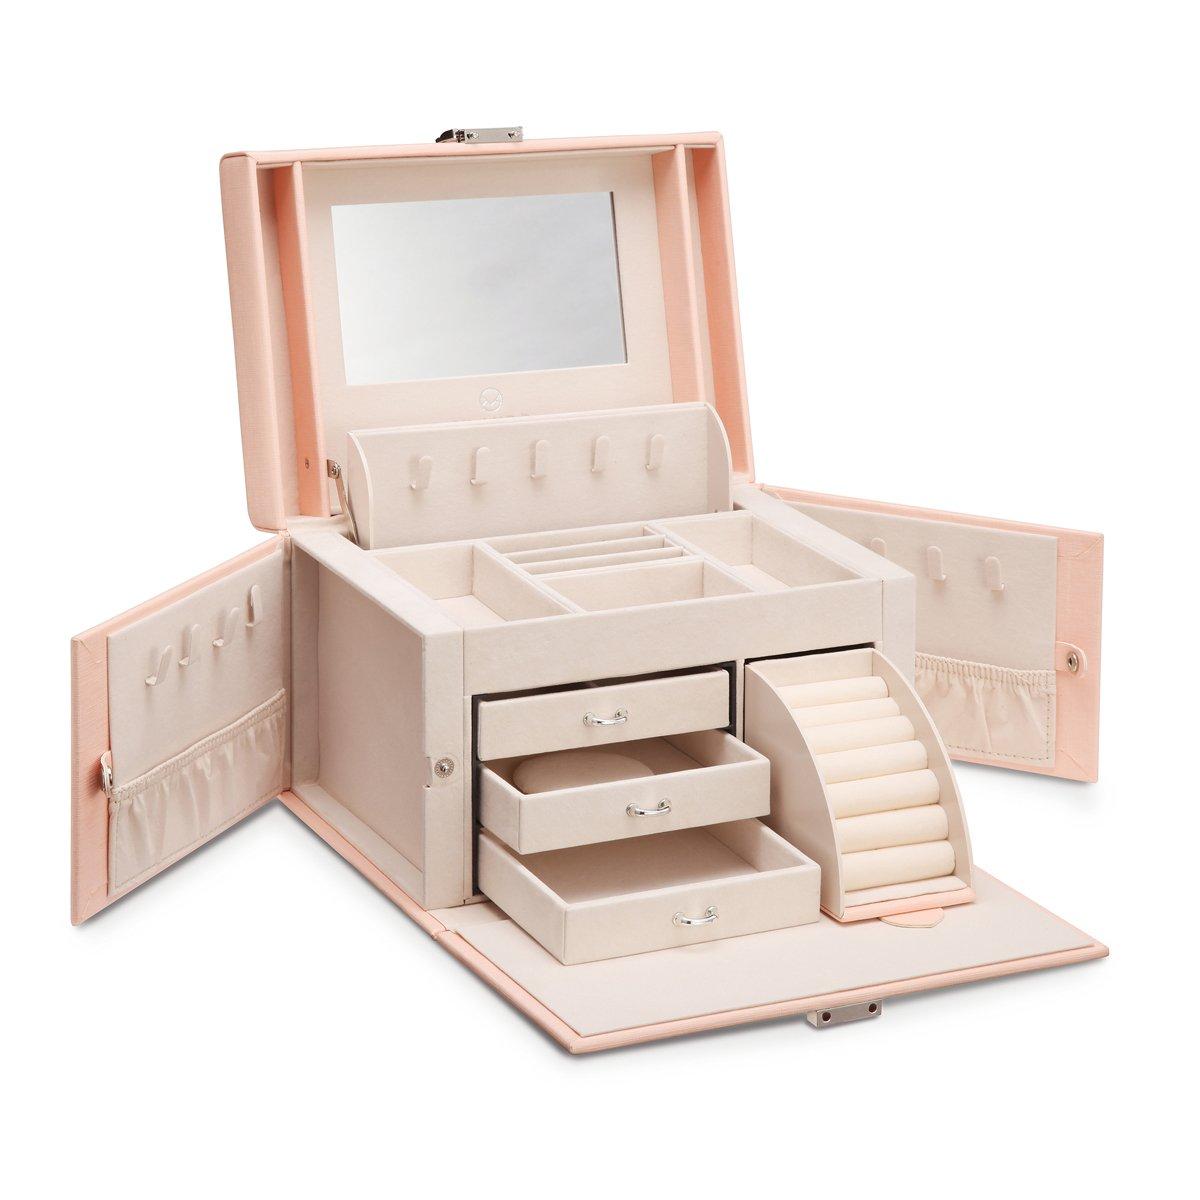 Vlando Jewelry Box, Faux Leather Medium Jewelry Organizer, Vintage gift for Women -Pink-Cross Pattern by Vlando (Image #2)